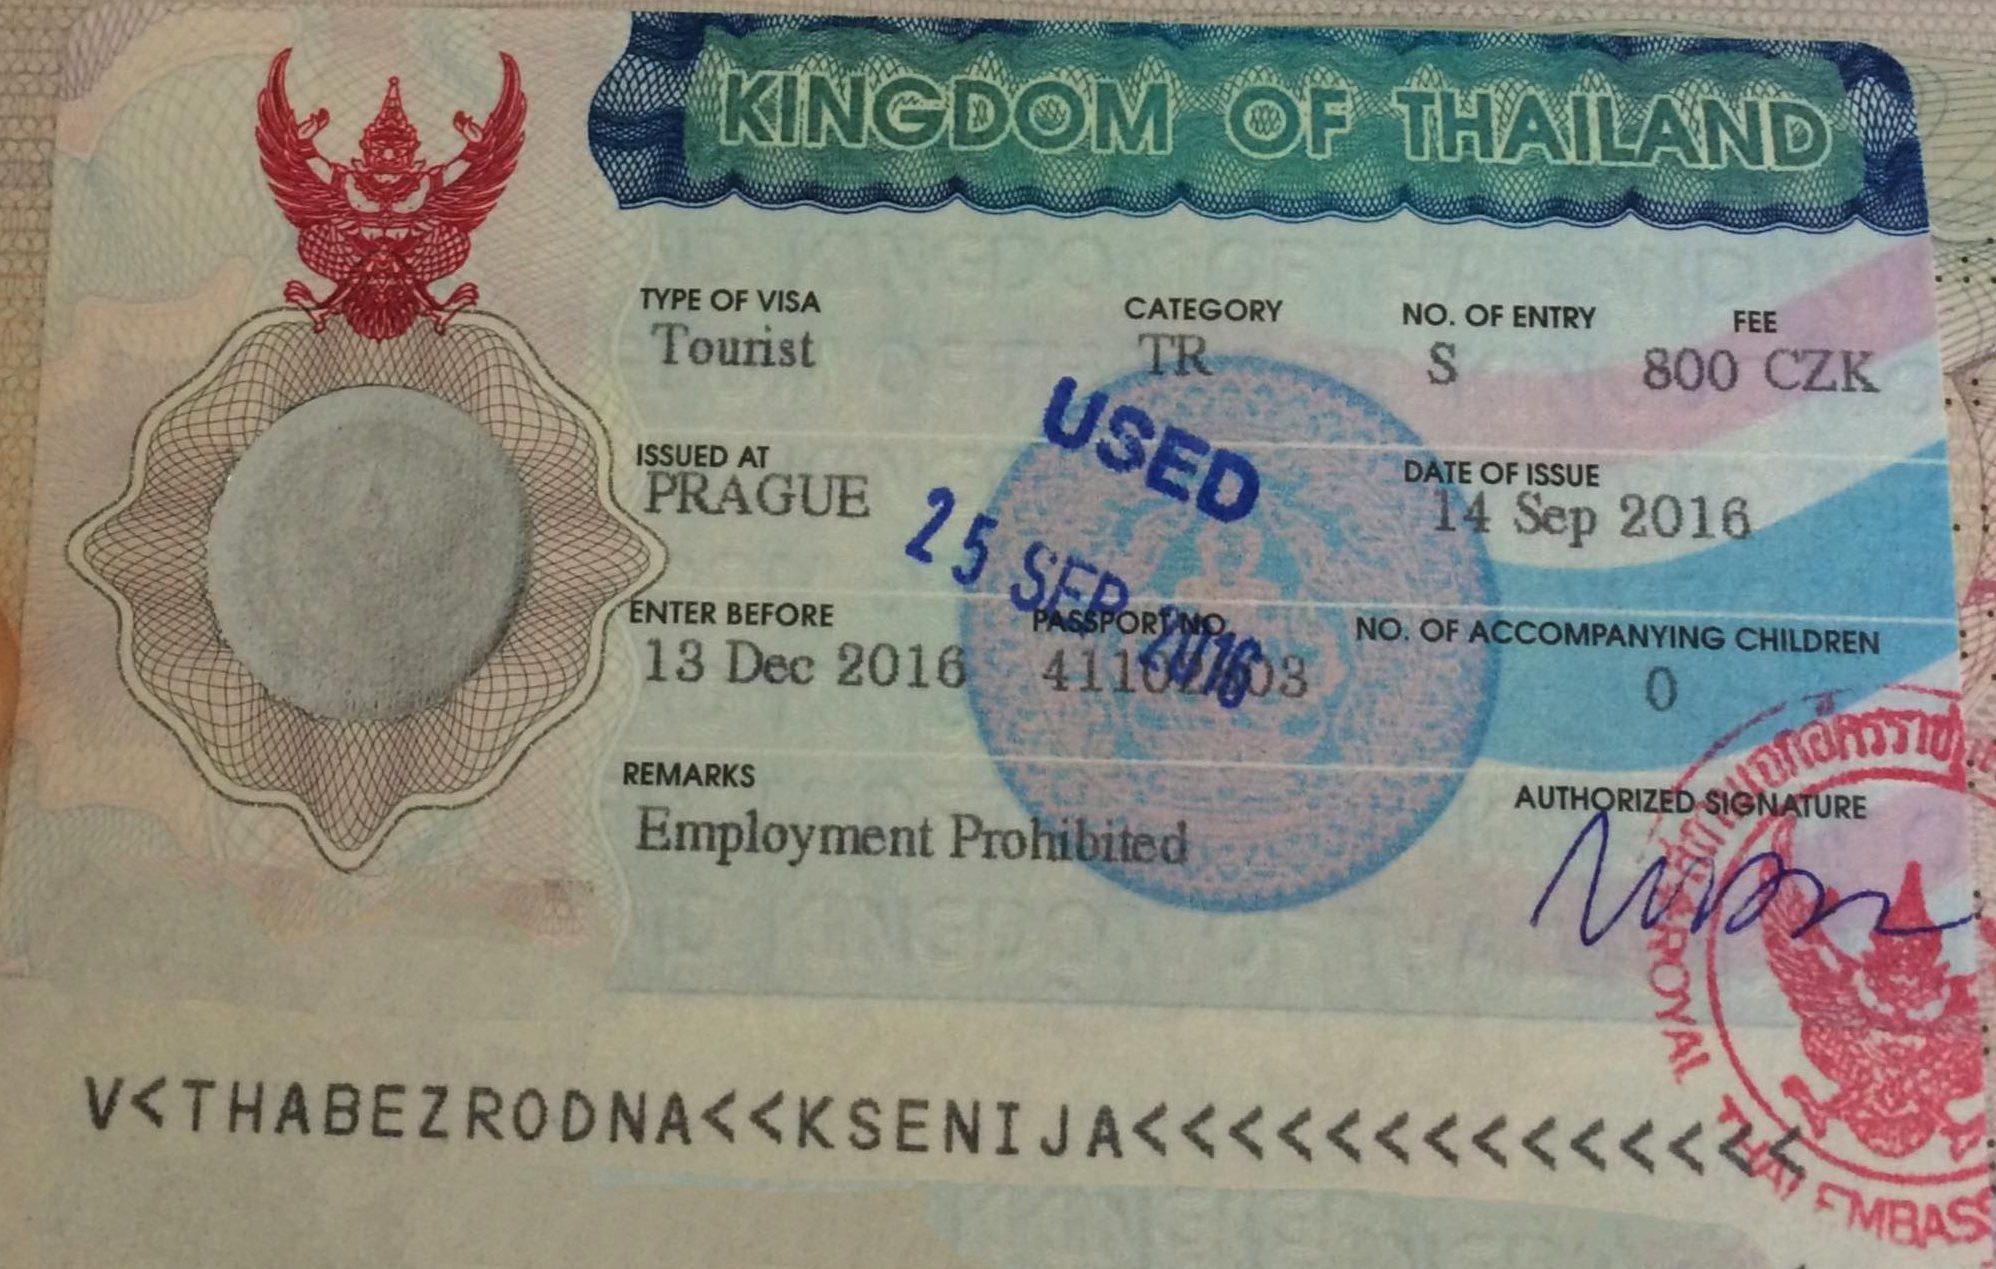 Lost Globetrotter_Jak se připravit na Thajsko_turisticke-vizum